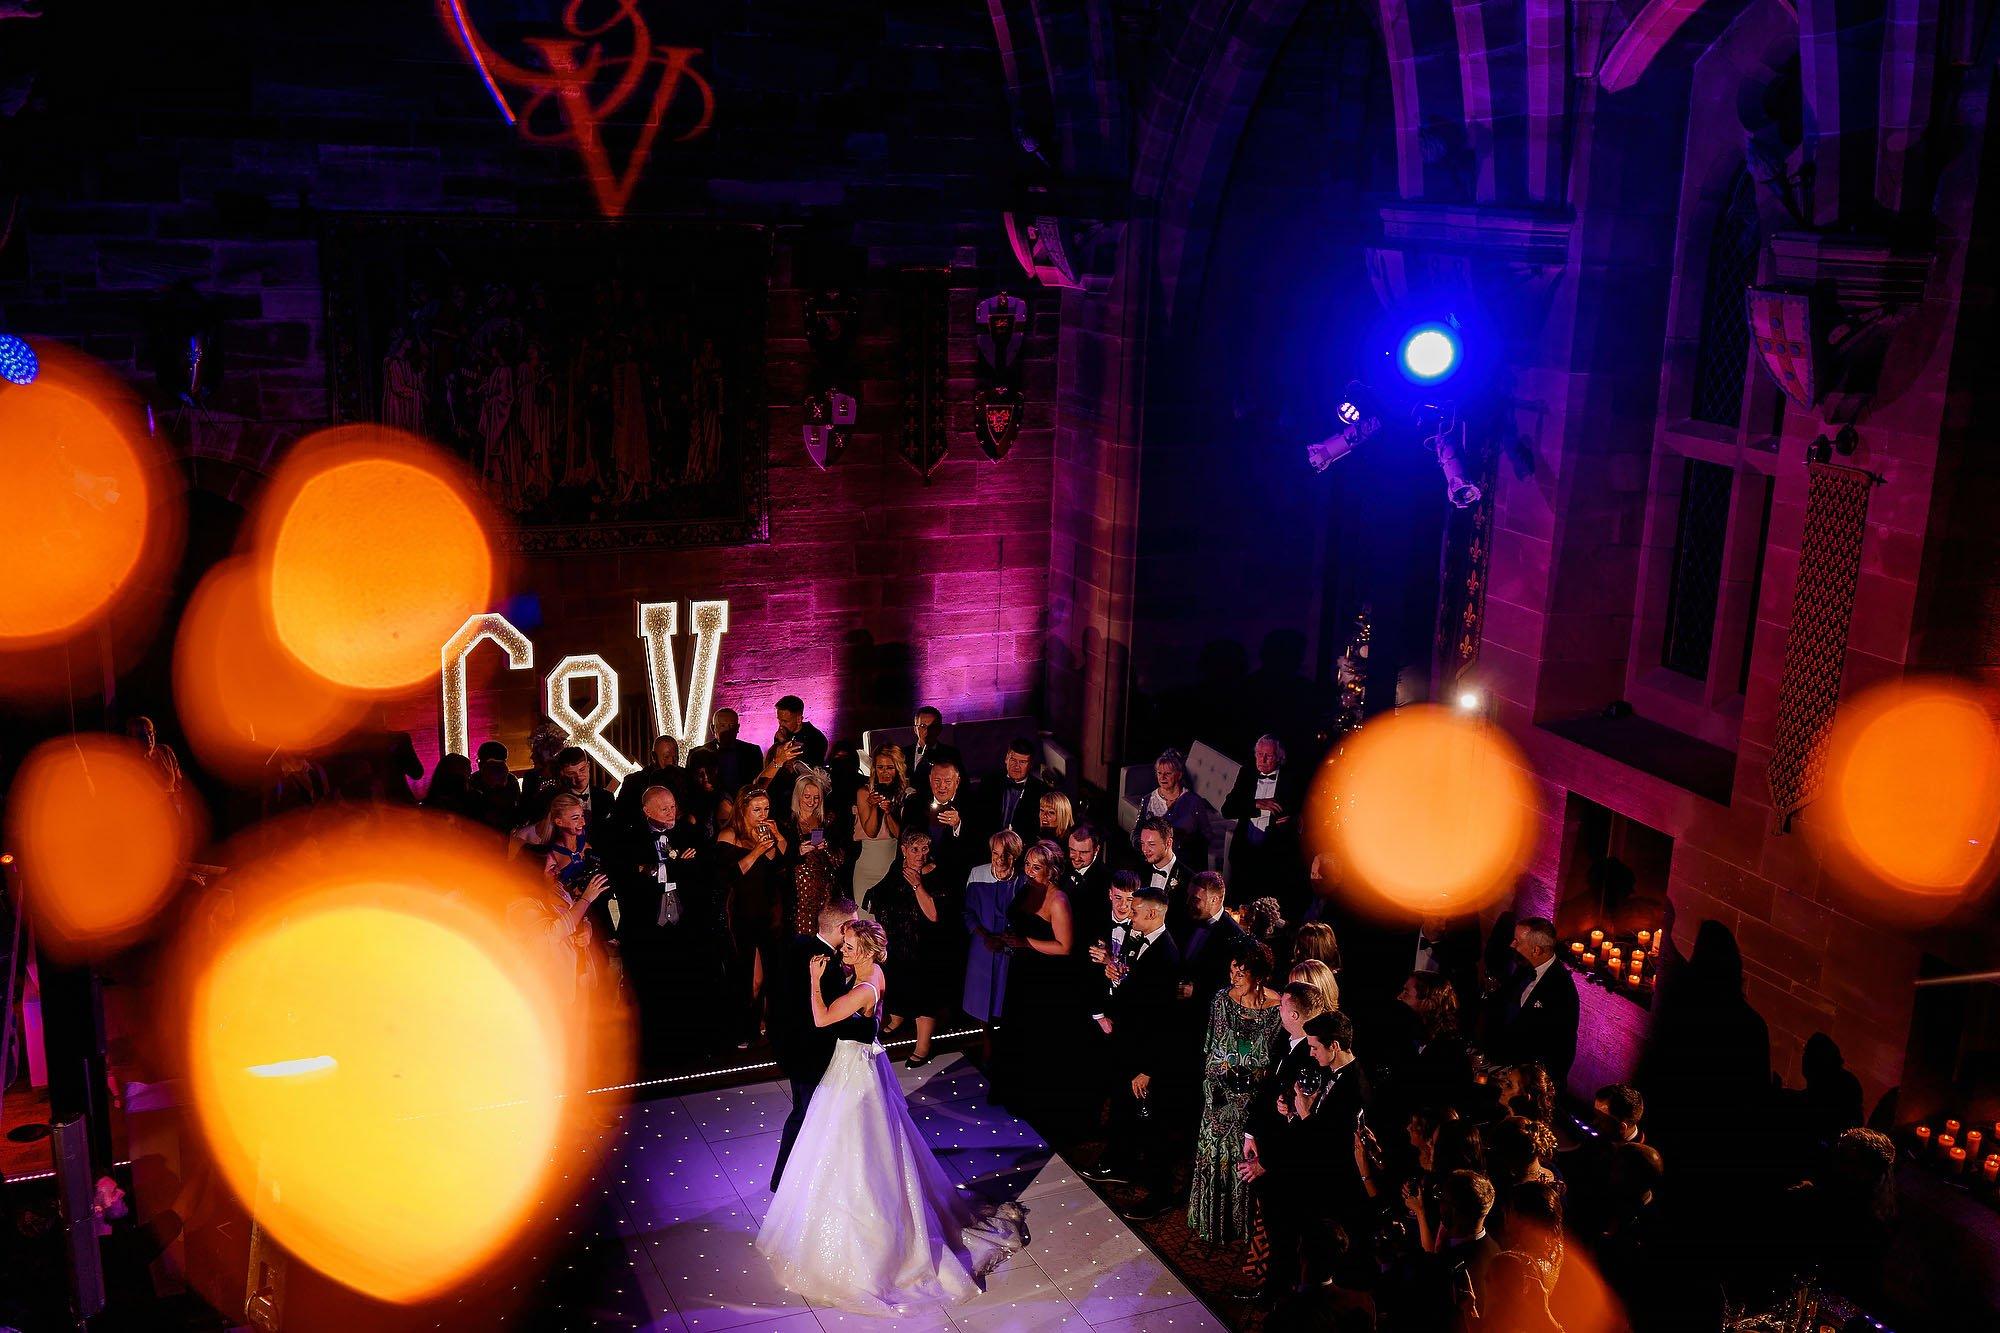 Winter Wedding at Peckforton Castle Cheshire - ARJ Photography®